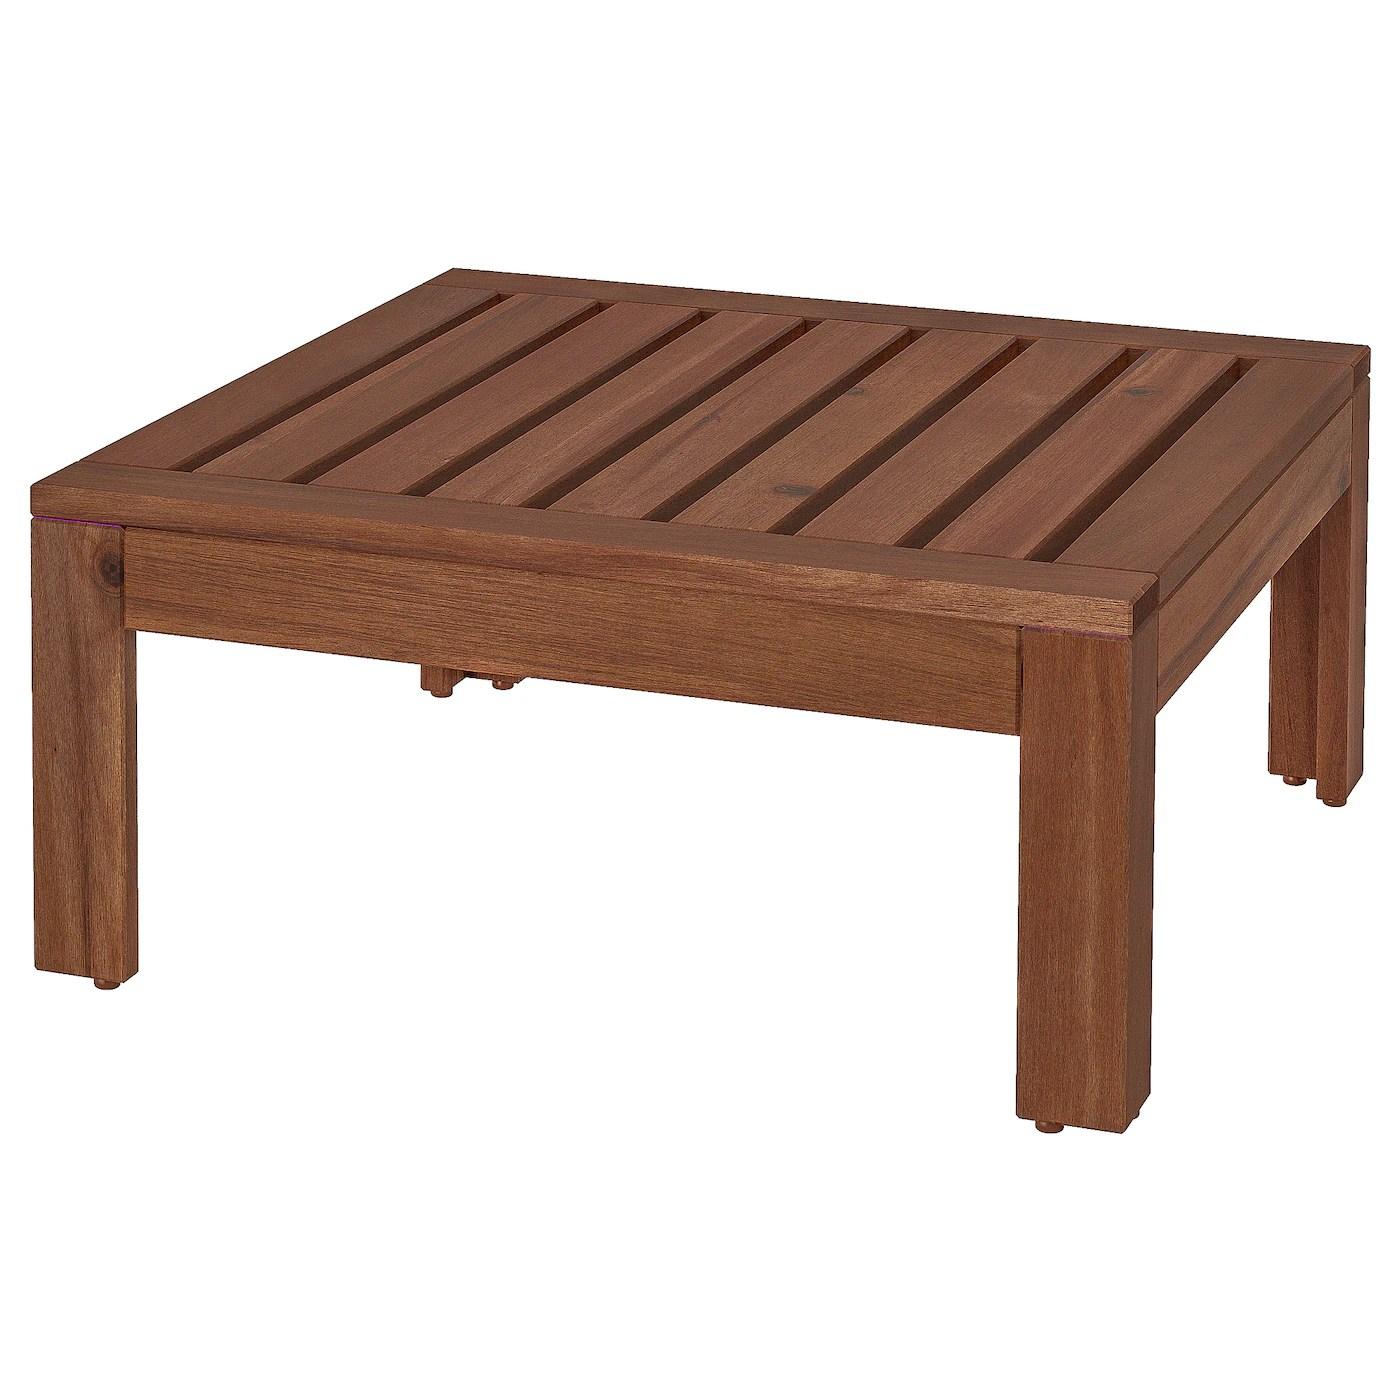 applaro module table tabouret exterieur teinte brun 63x63 cm